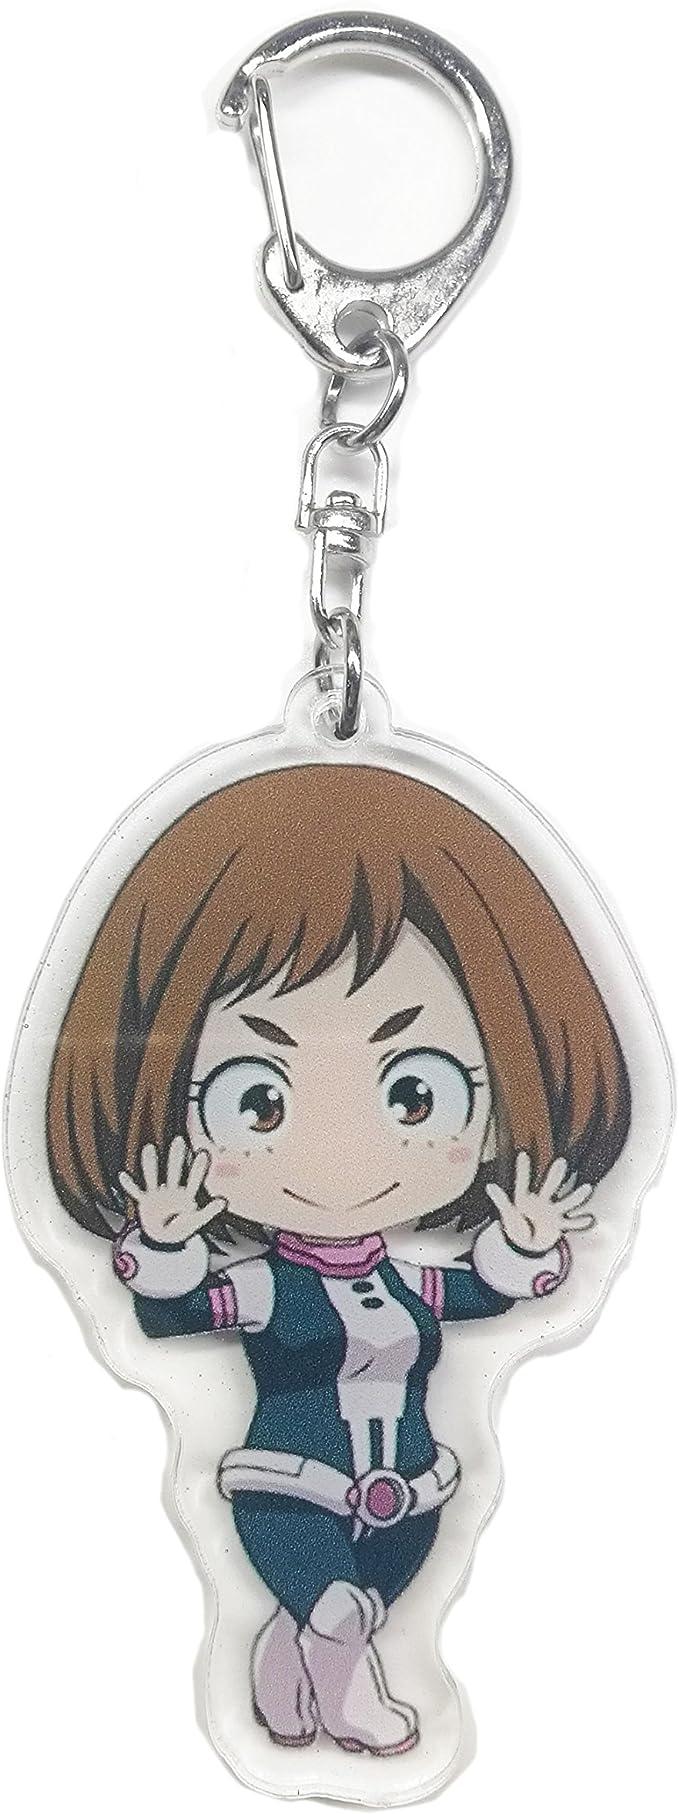 Set of 3 My Hero Academia Anime Acrylic Keychain Midoriya Deku Ochaco Toga